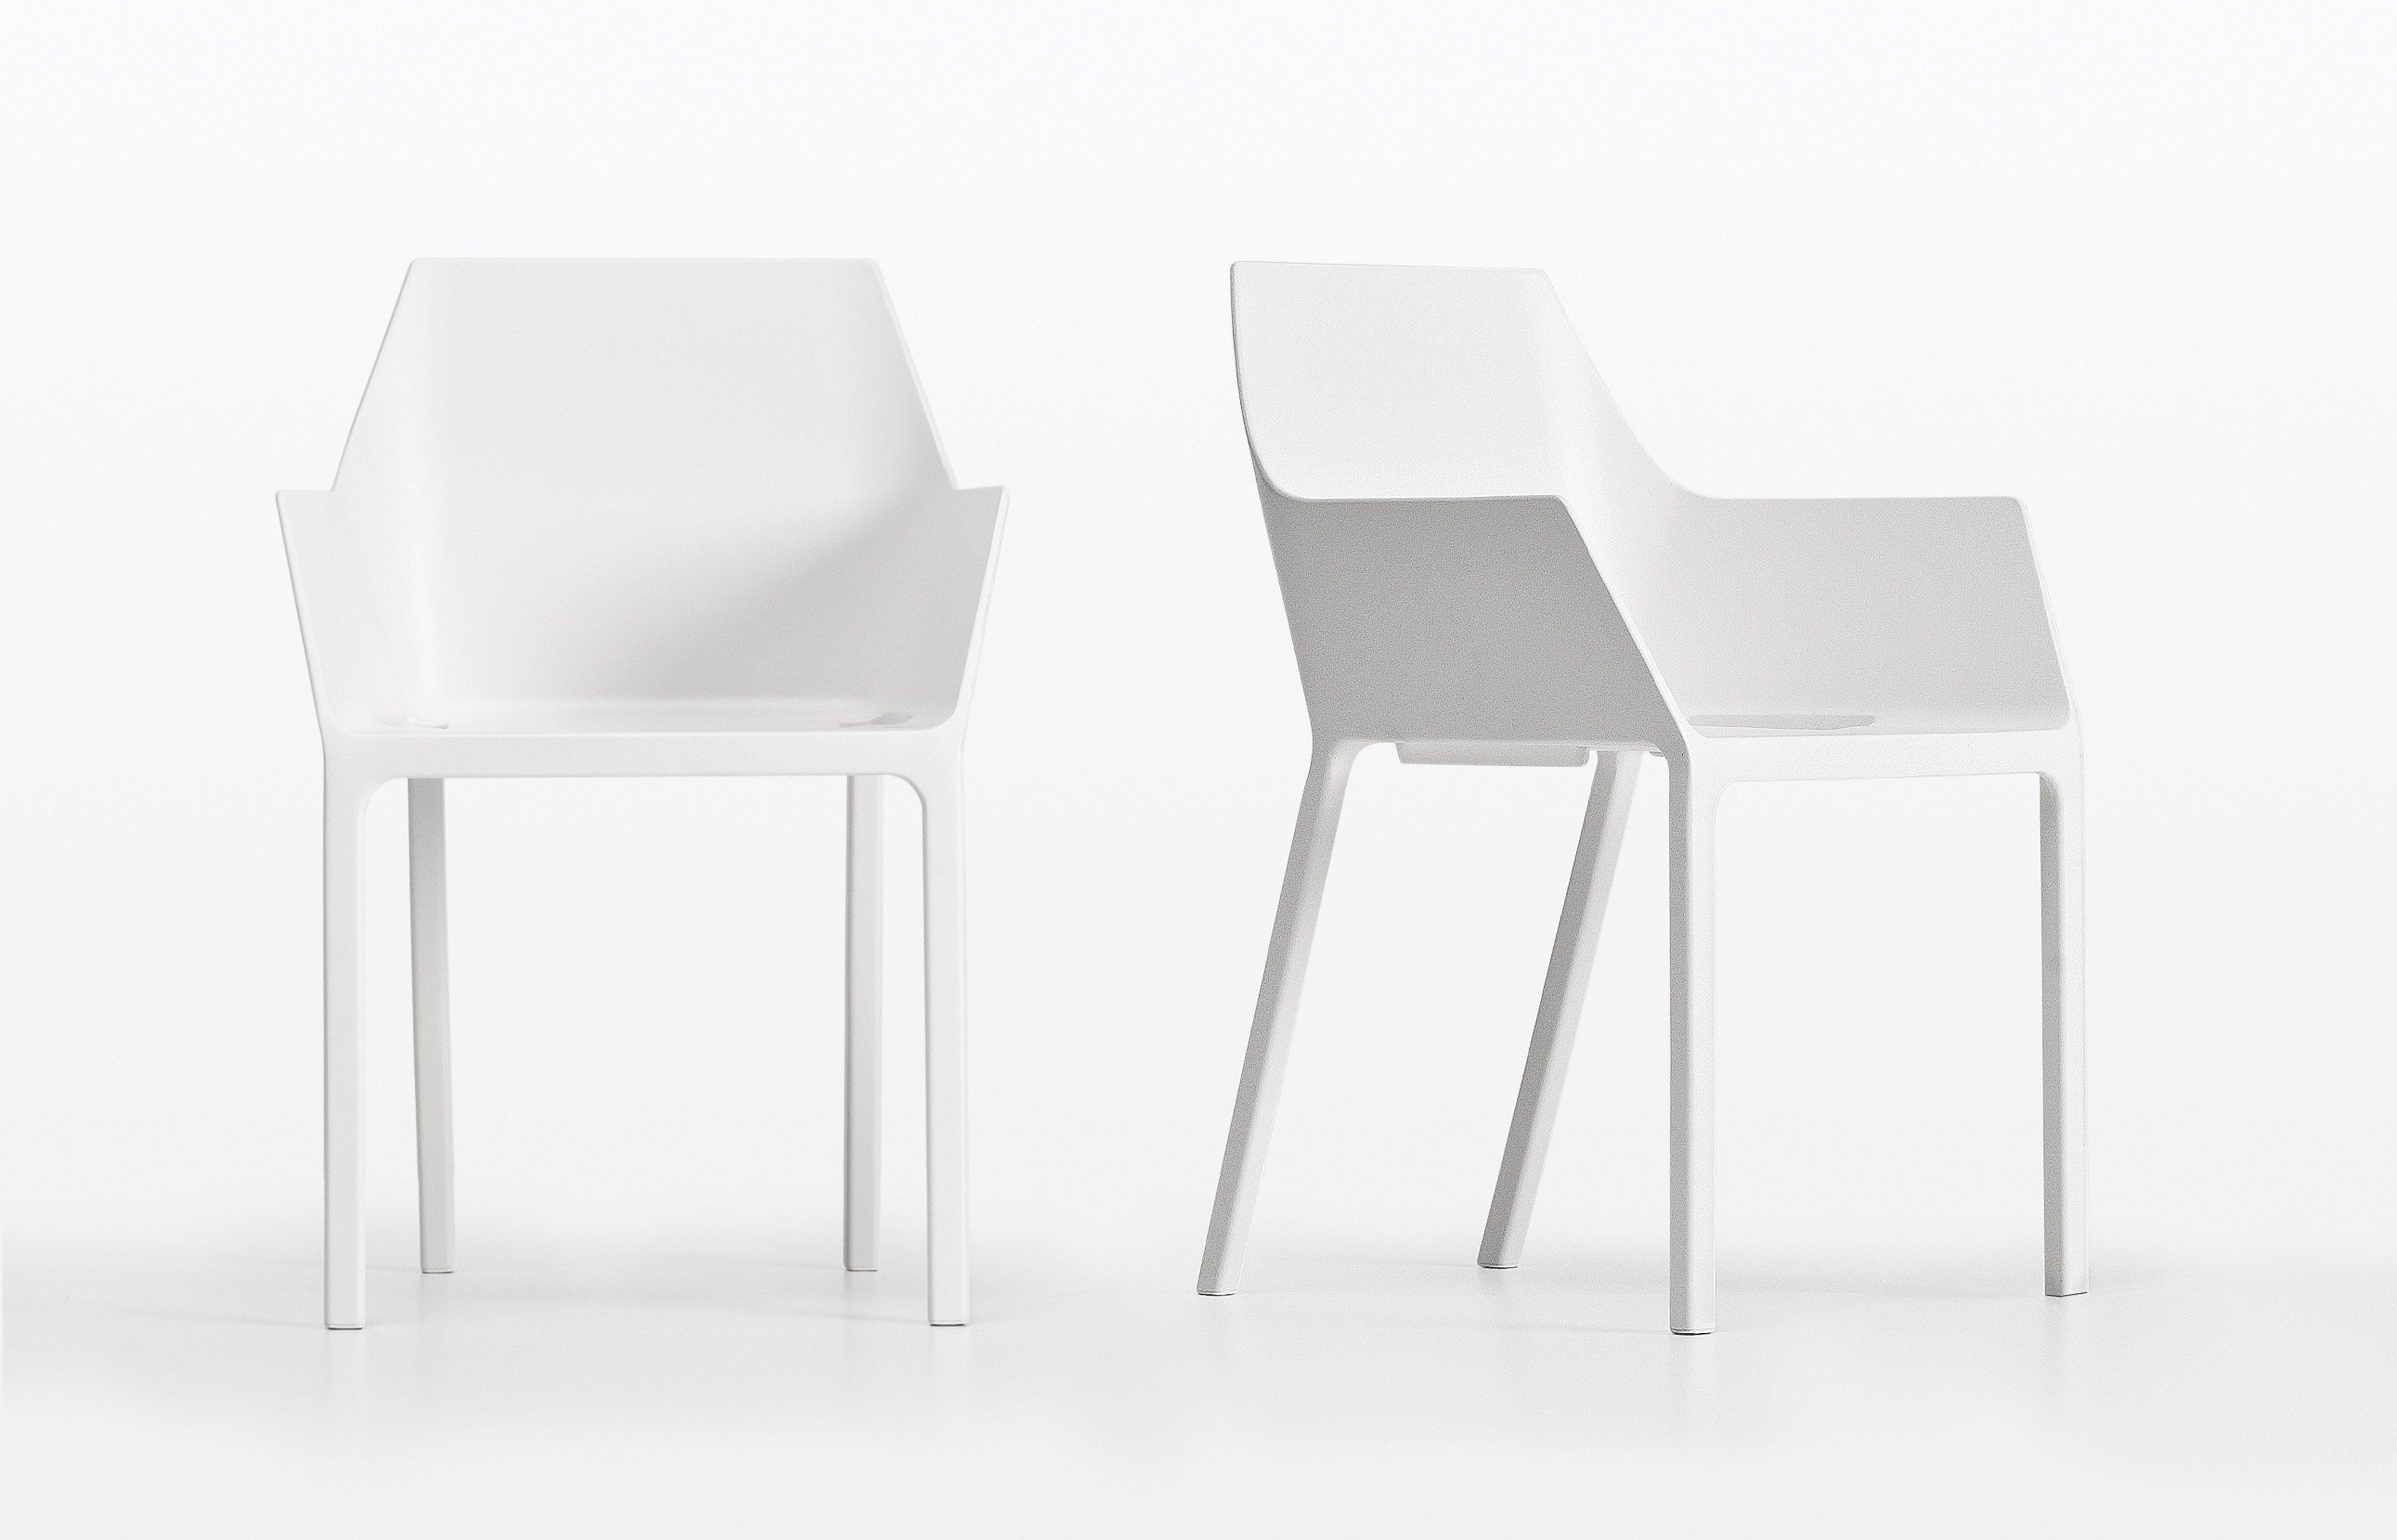 Betaalbare Design Stoelen.Mem Stoel Kristalia Betaalbaar Design Www Officehome Be Vraag